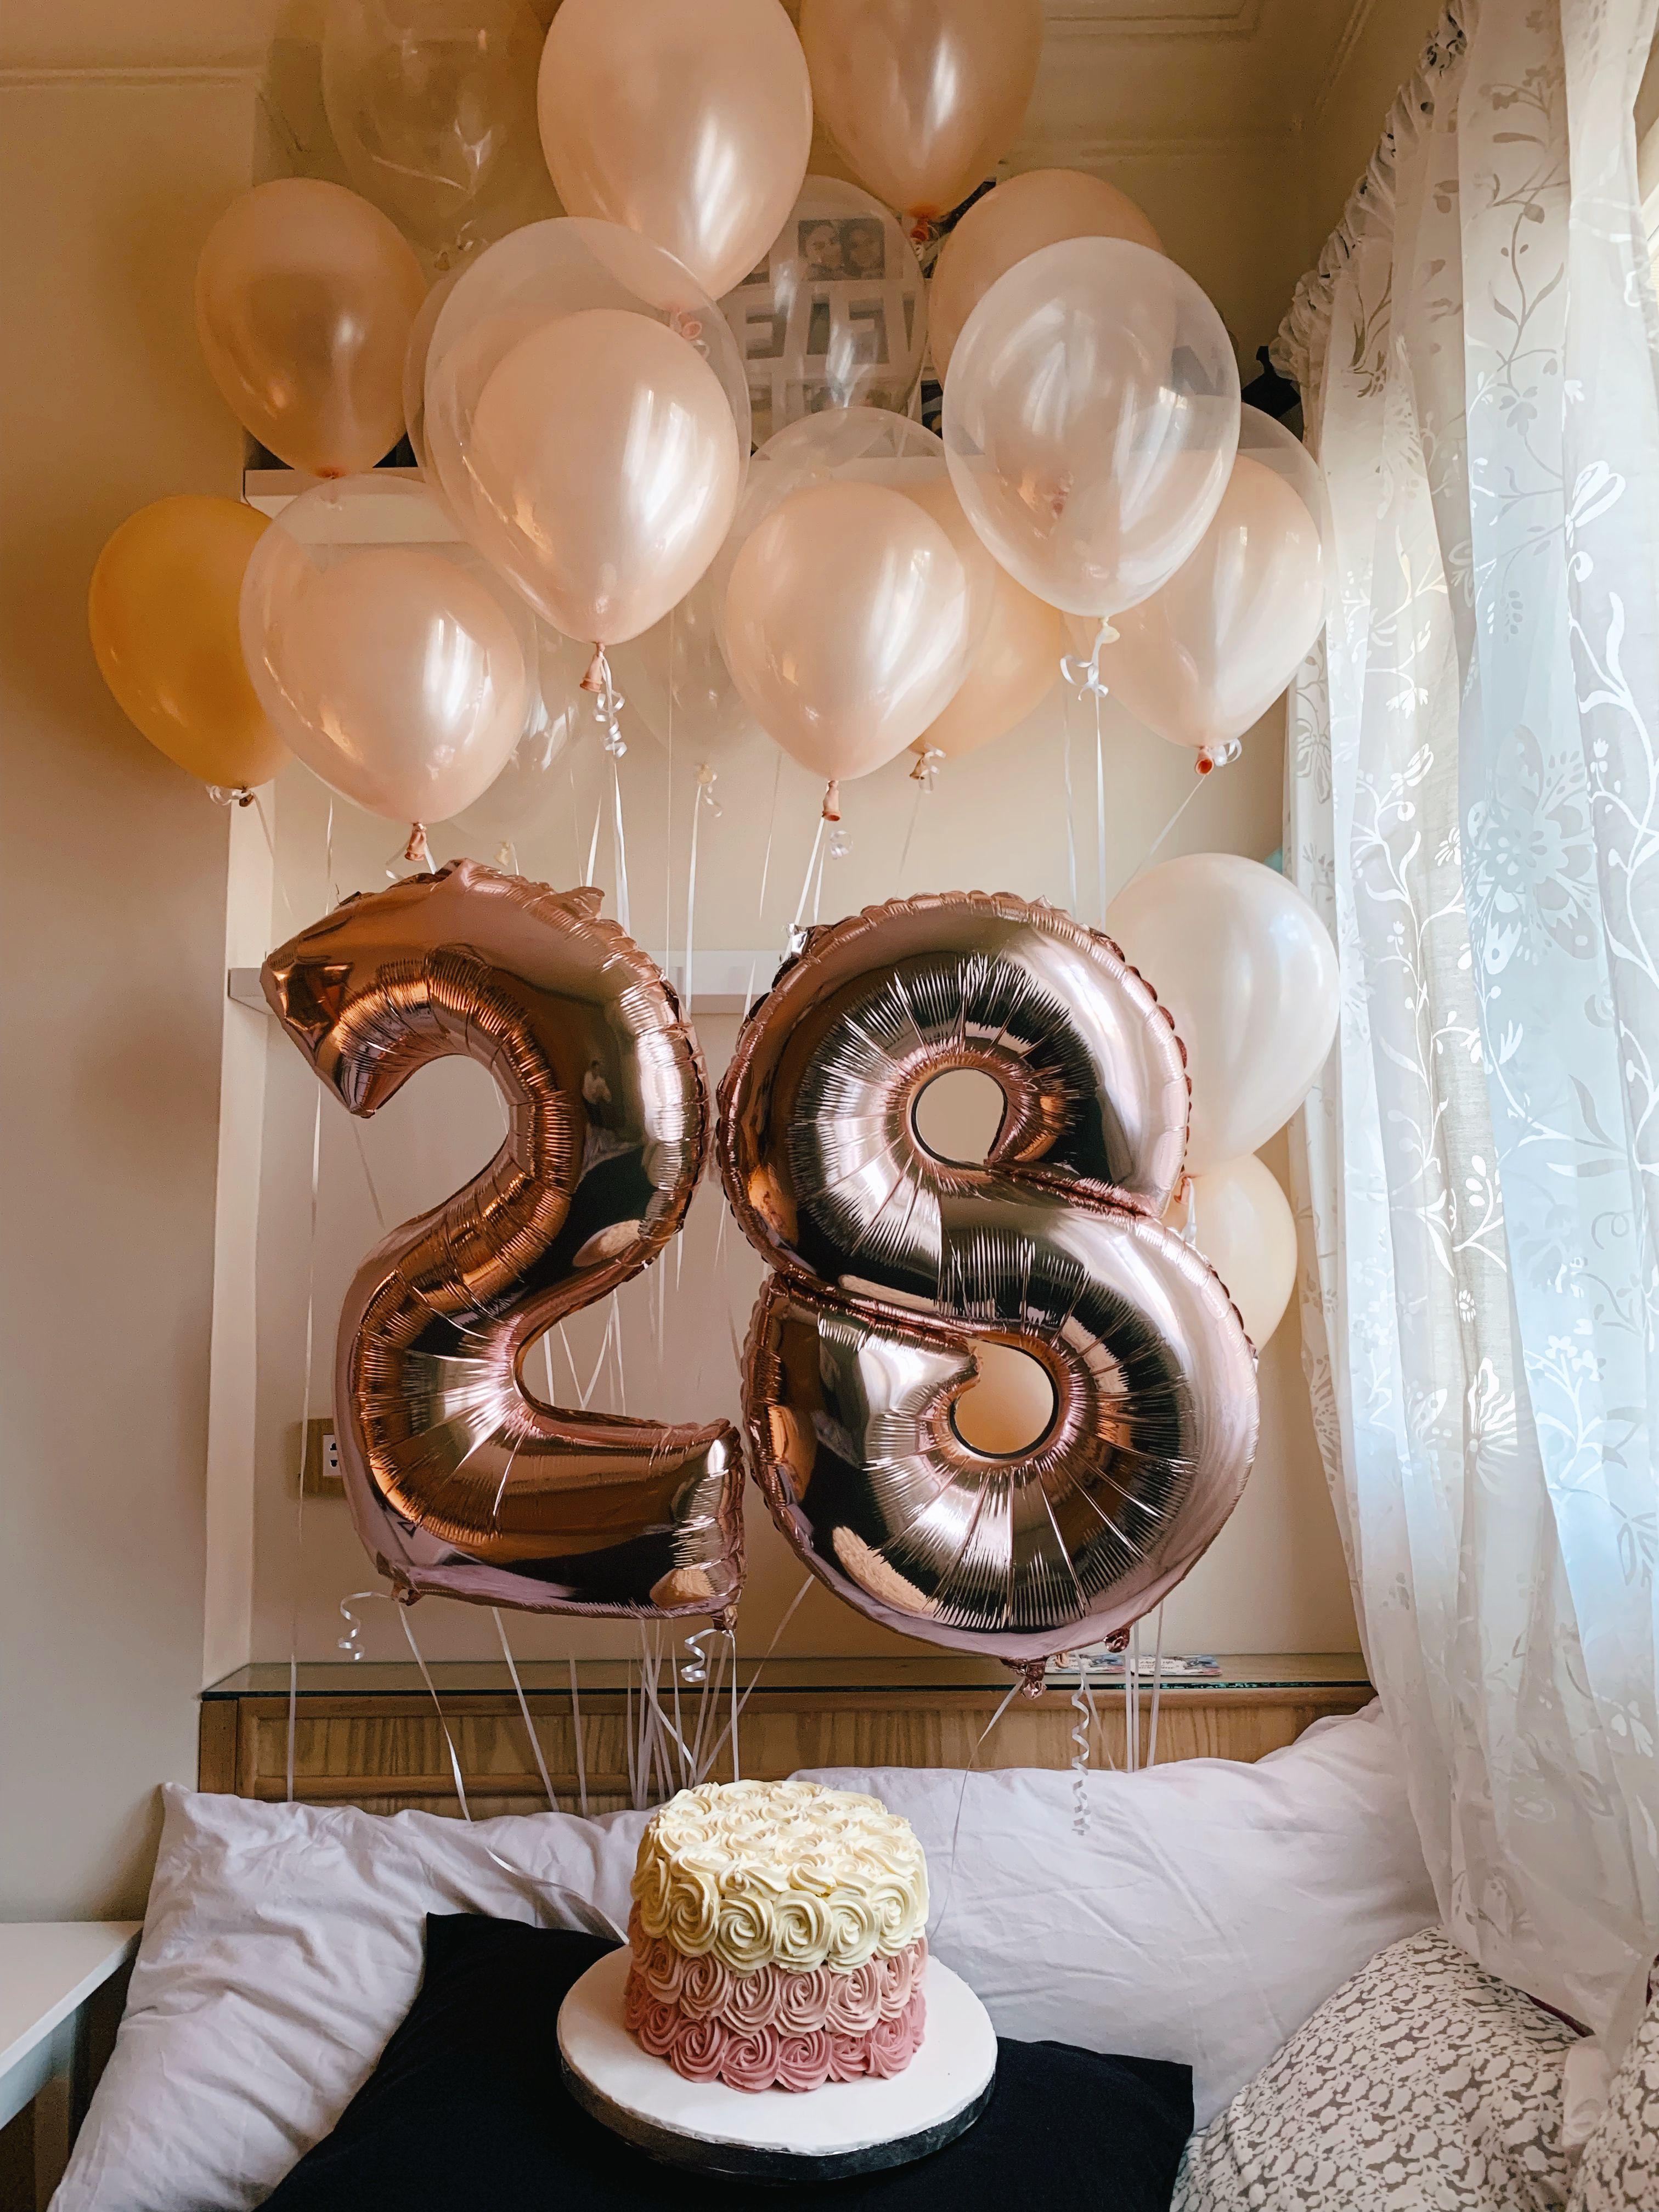 Magnificent 28 Balloons Birthday Cake Birthday Balloons Birthdaycake In Birthday Cards Printable Inklcafe Filternl